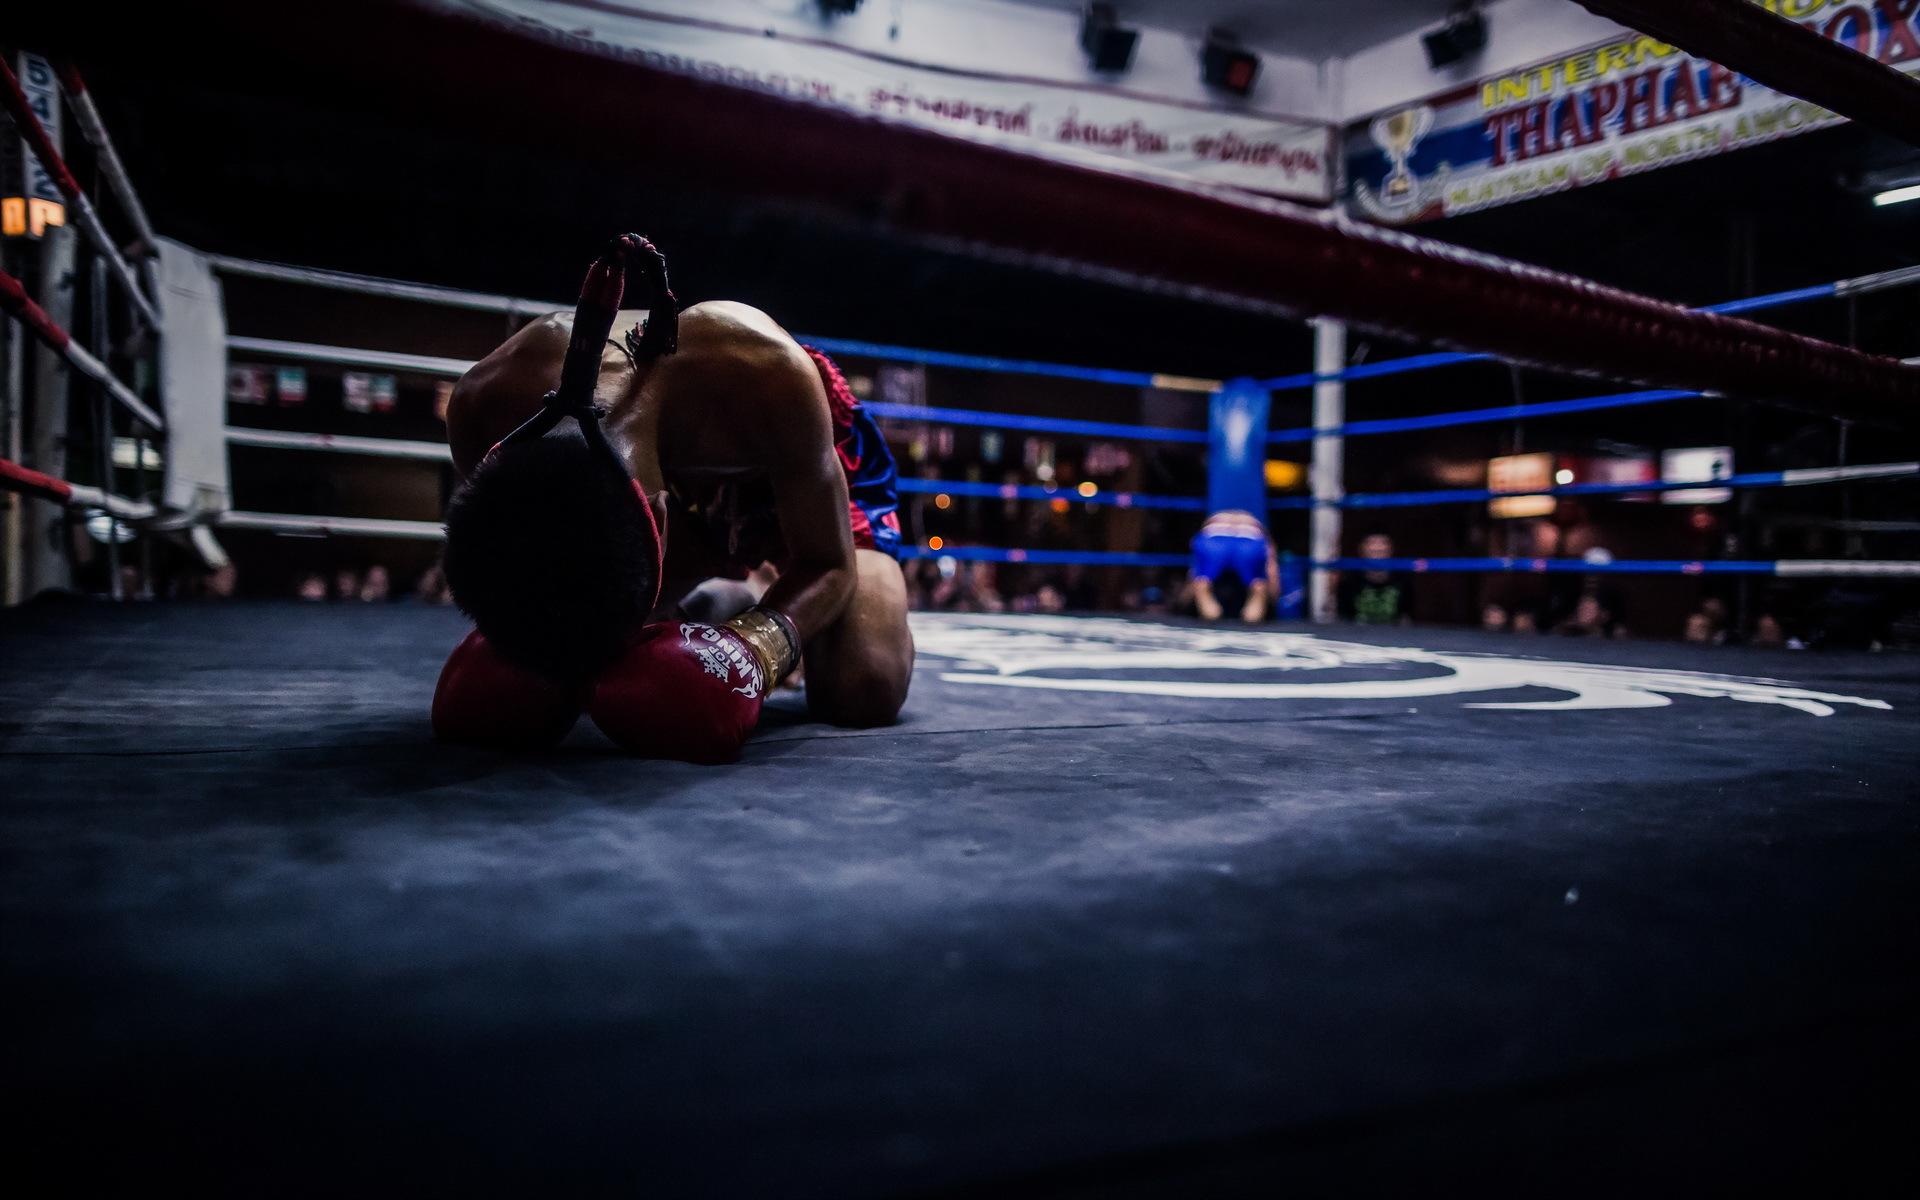 Best 36 Kickboxing Backgrounds on HipWallpaper Fitness 1920x1200